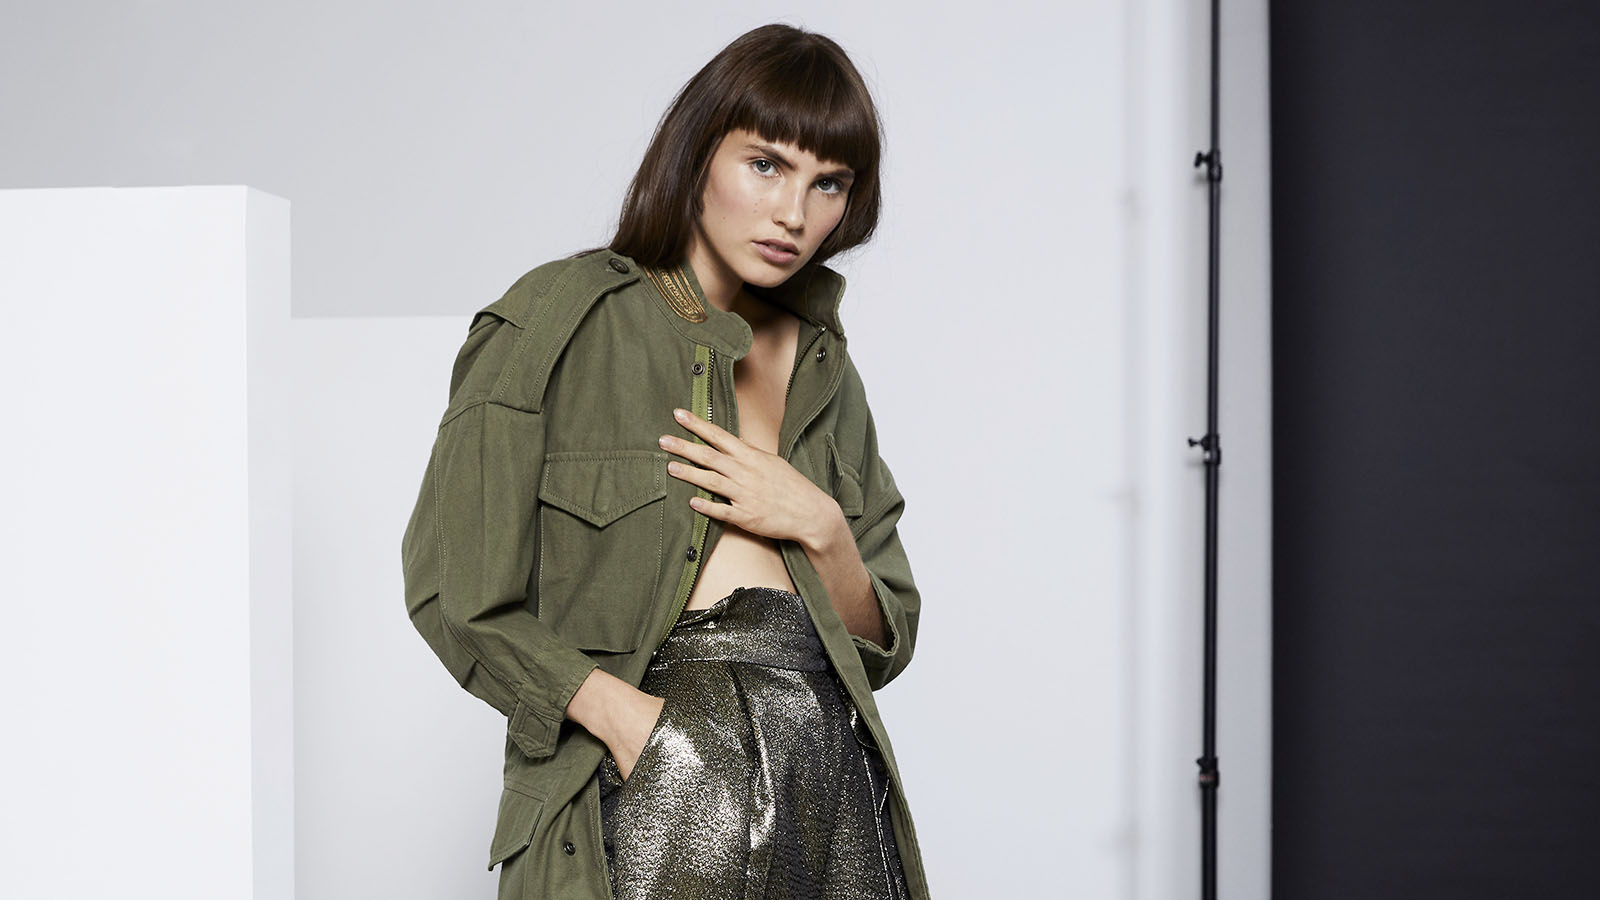 Lenon Collection LookbookModel - Angelina JessonHair / Makeup - Barbara Yniguez